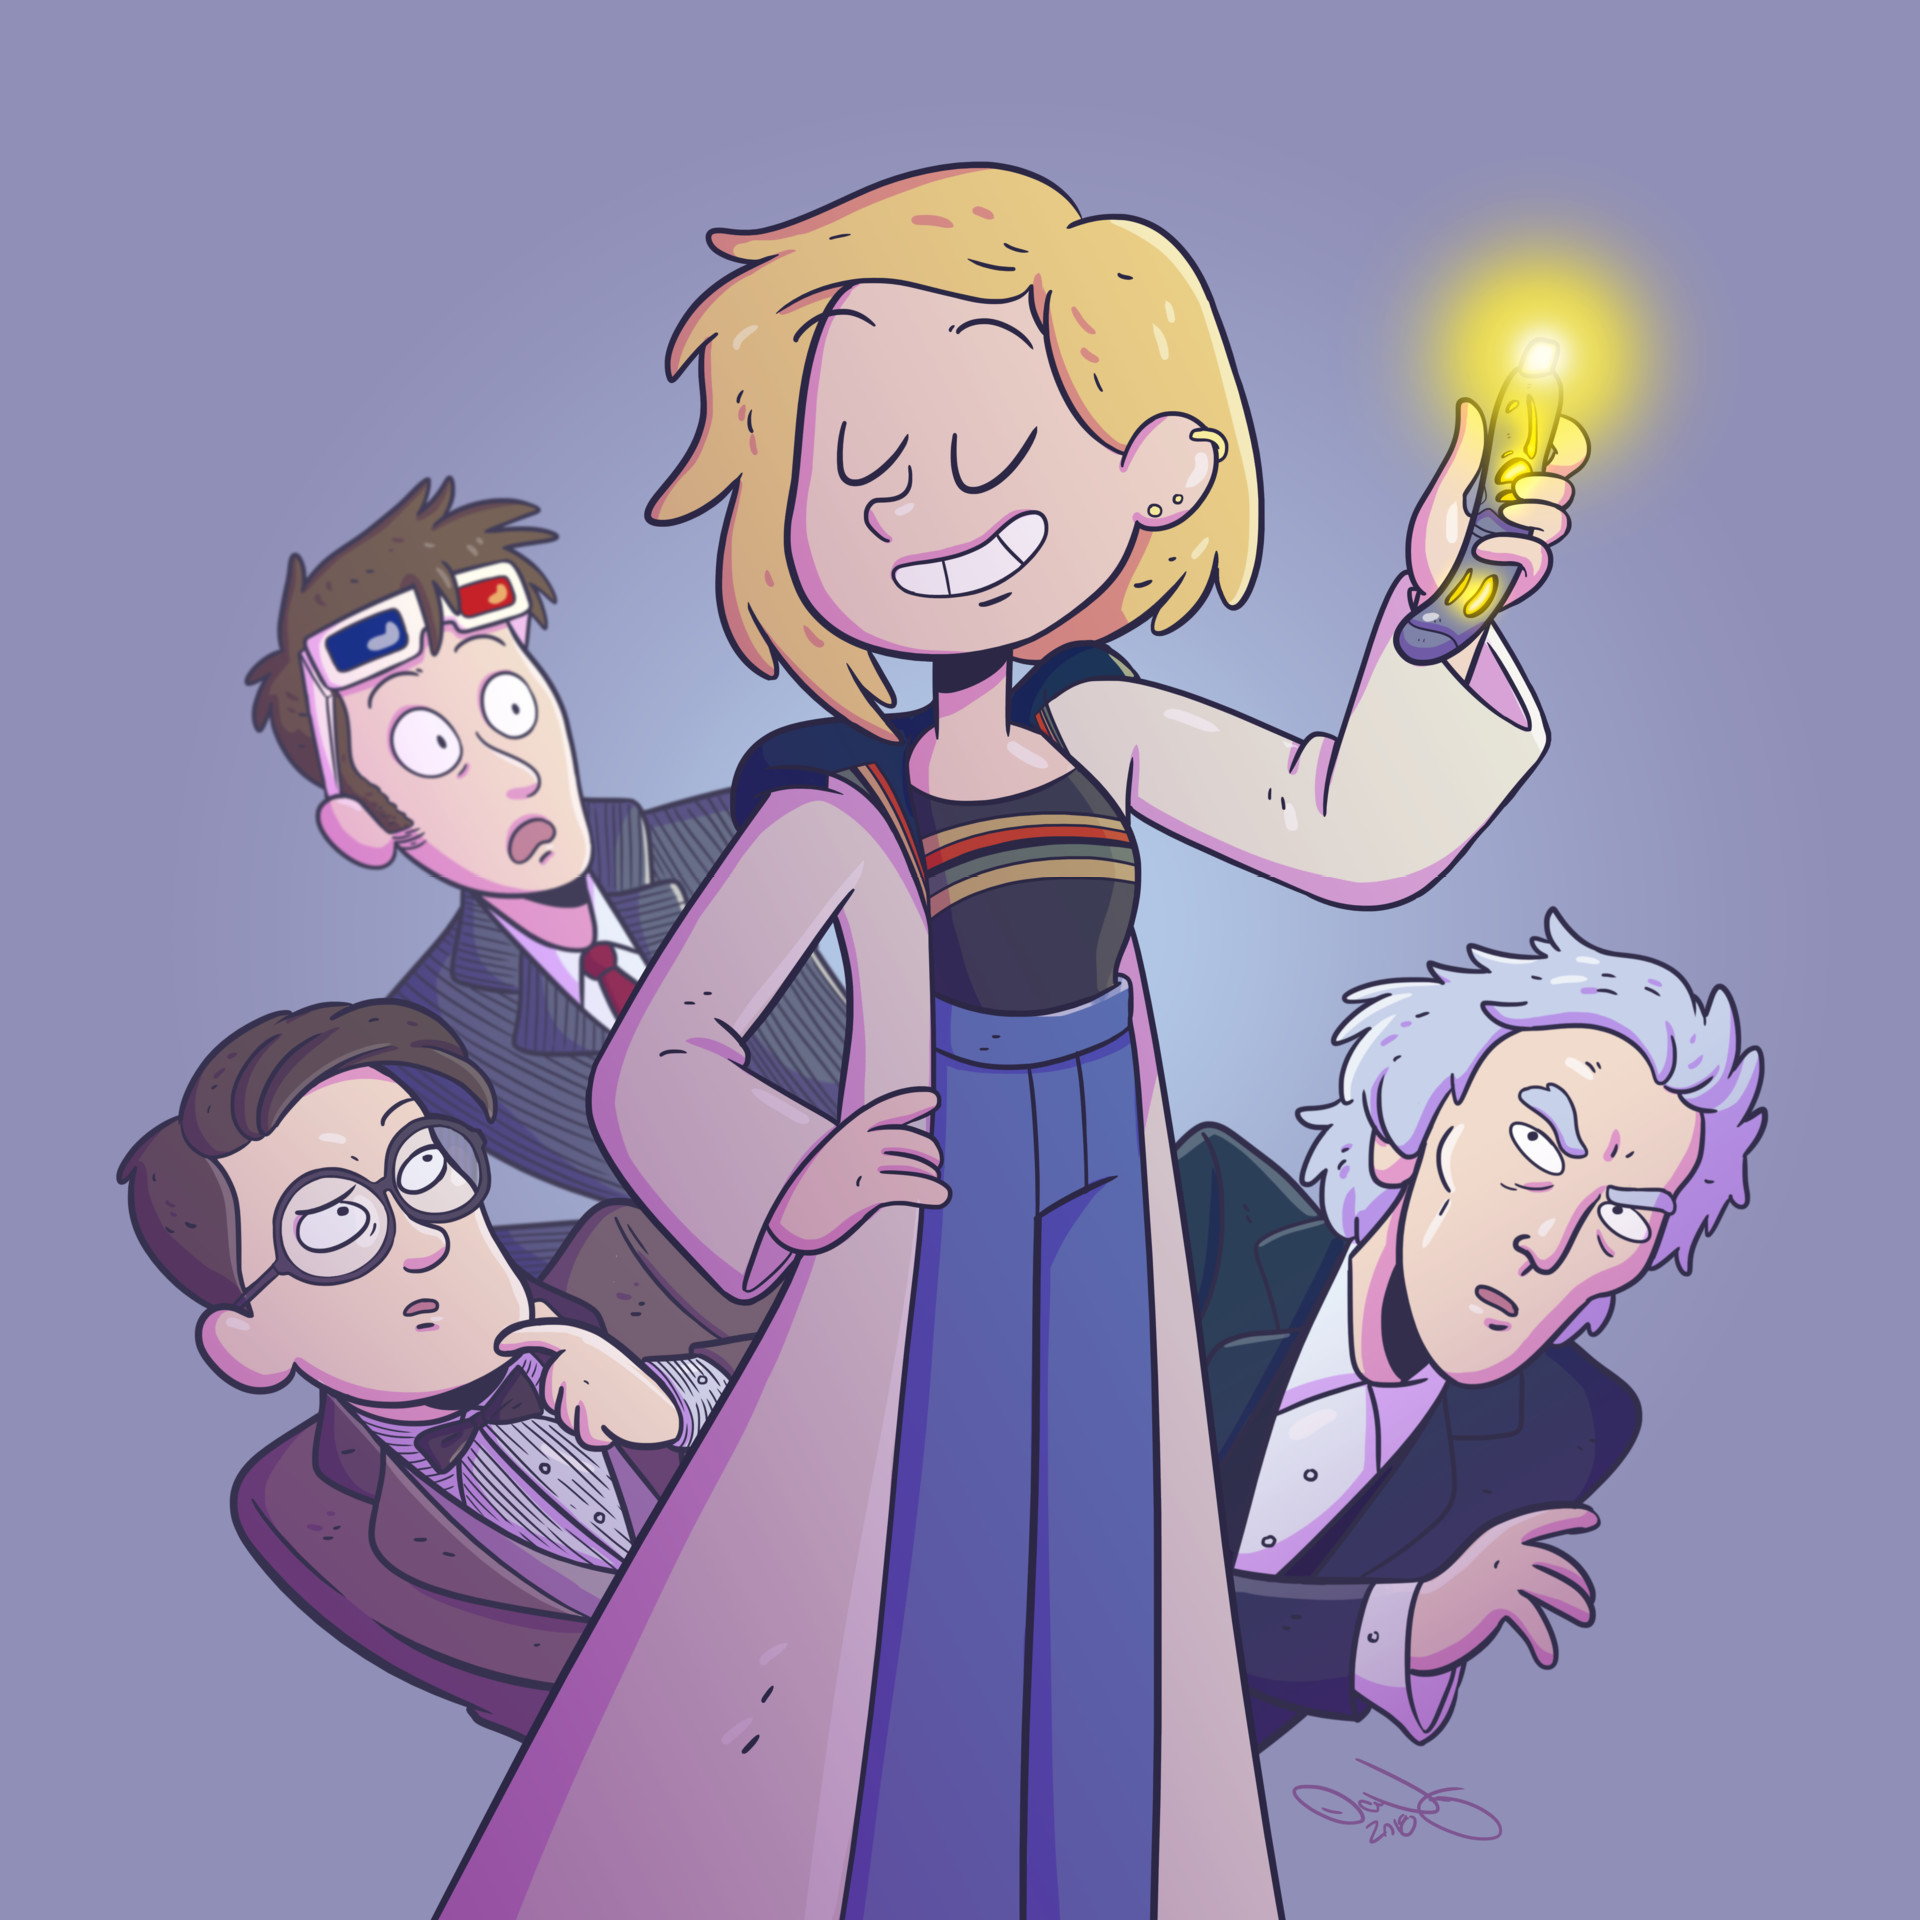 Dan velez 13 doctor who sonics